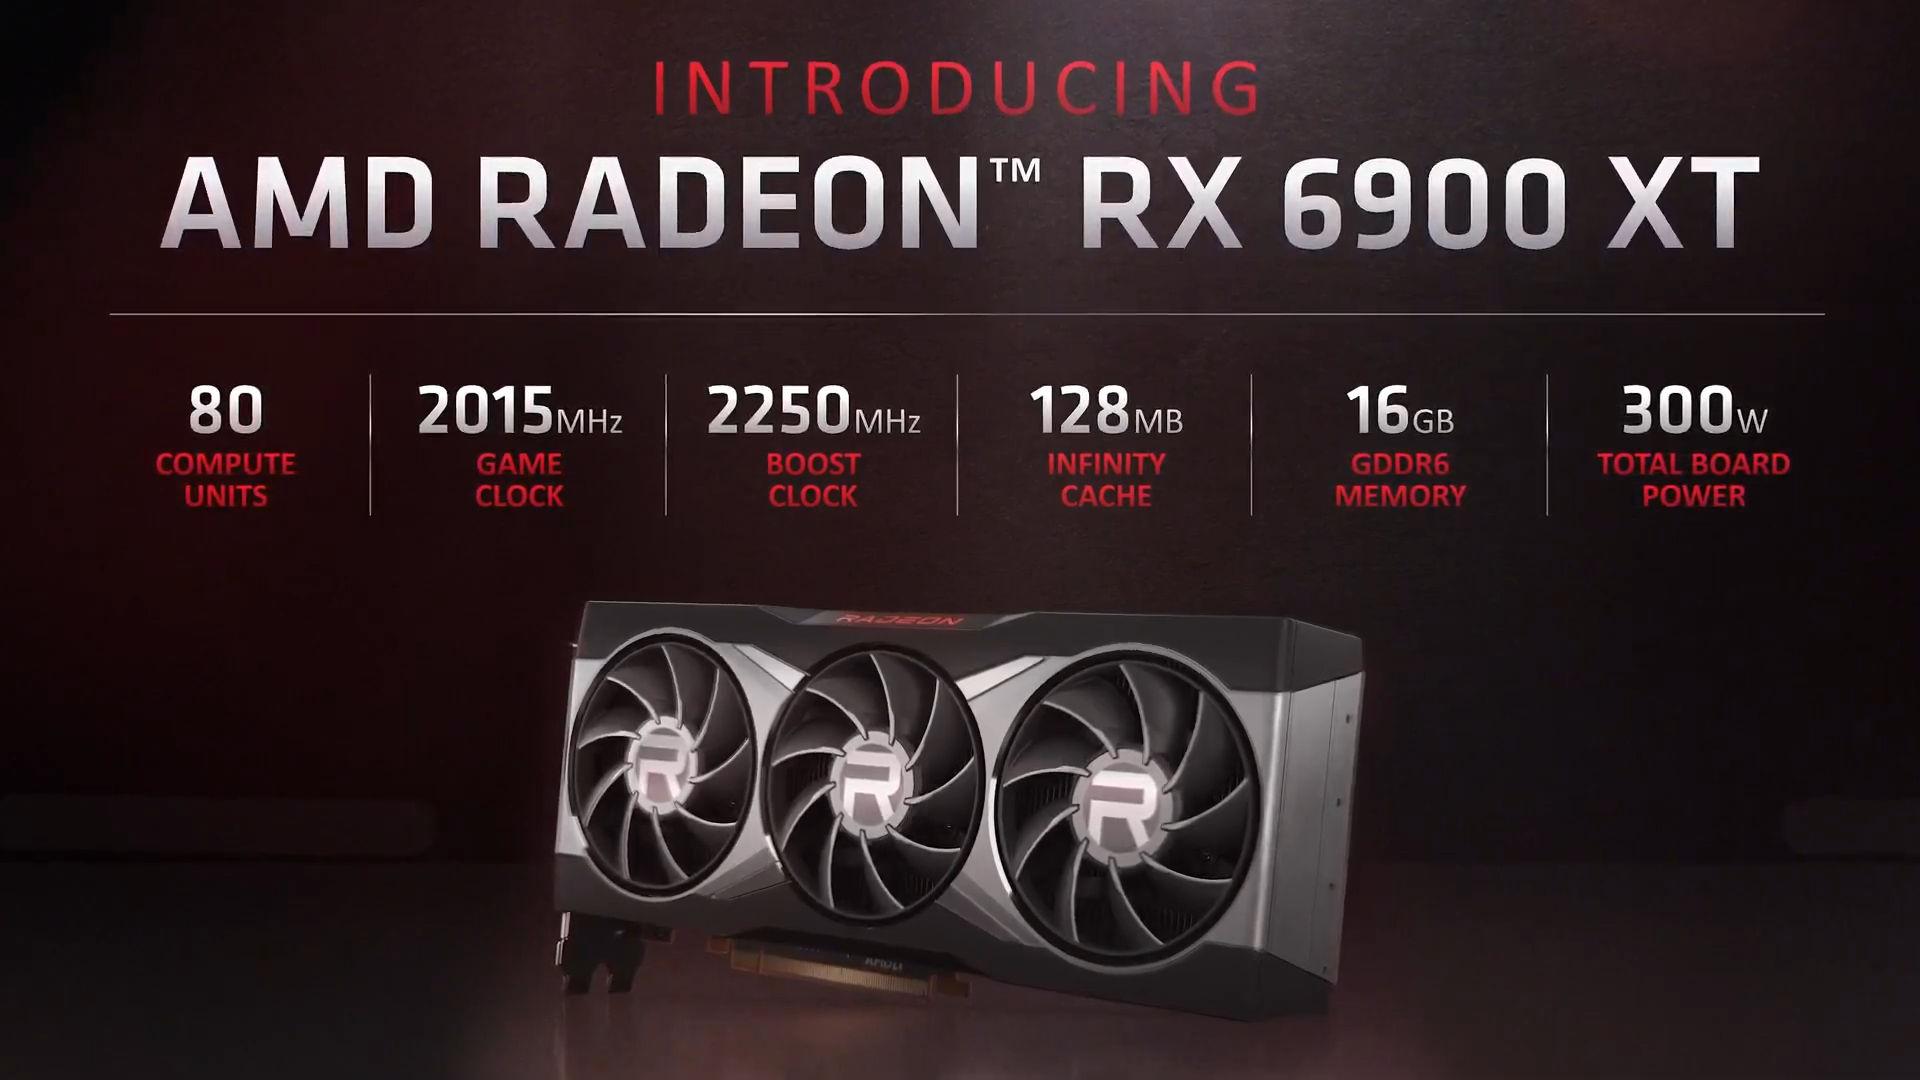 AMD-Radeon-RX-6900-XT-Specs.jpg